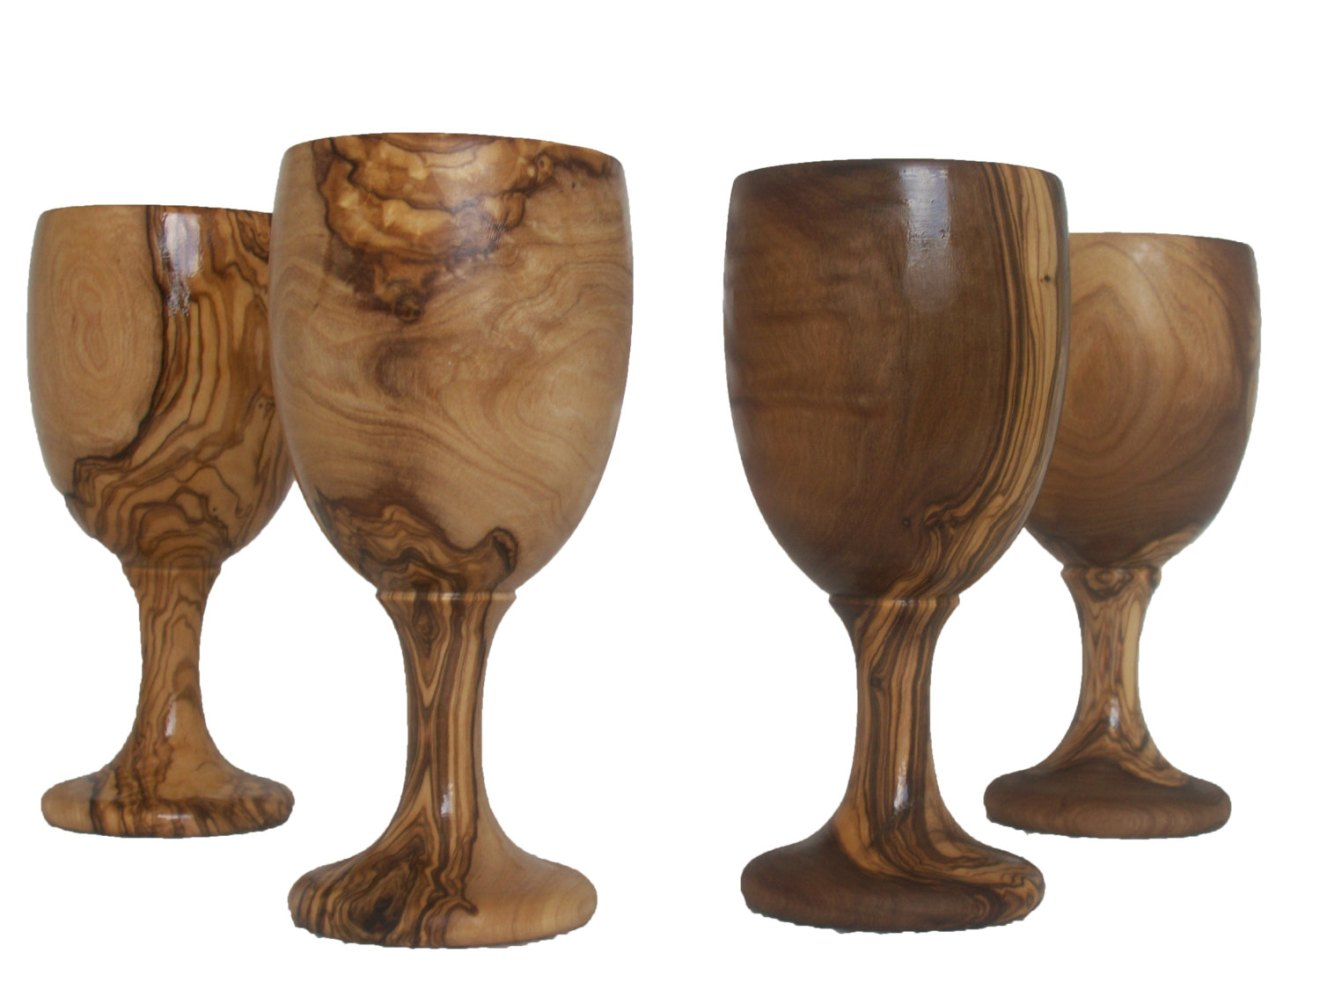 wooden-wine-glasses-1